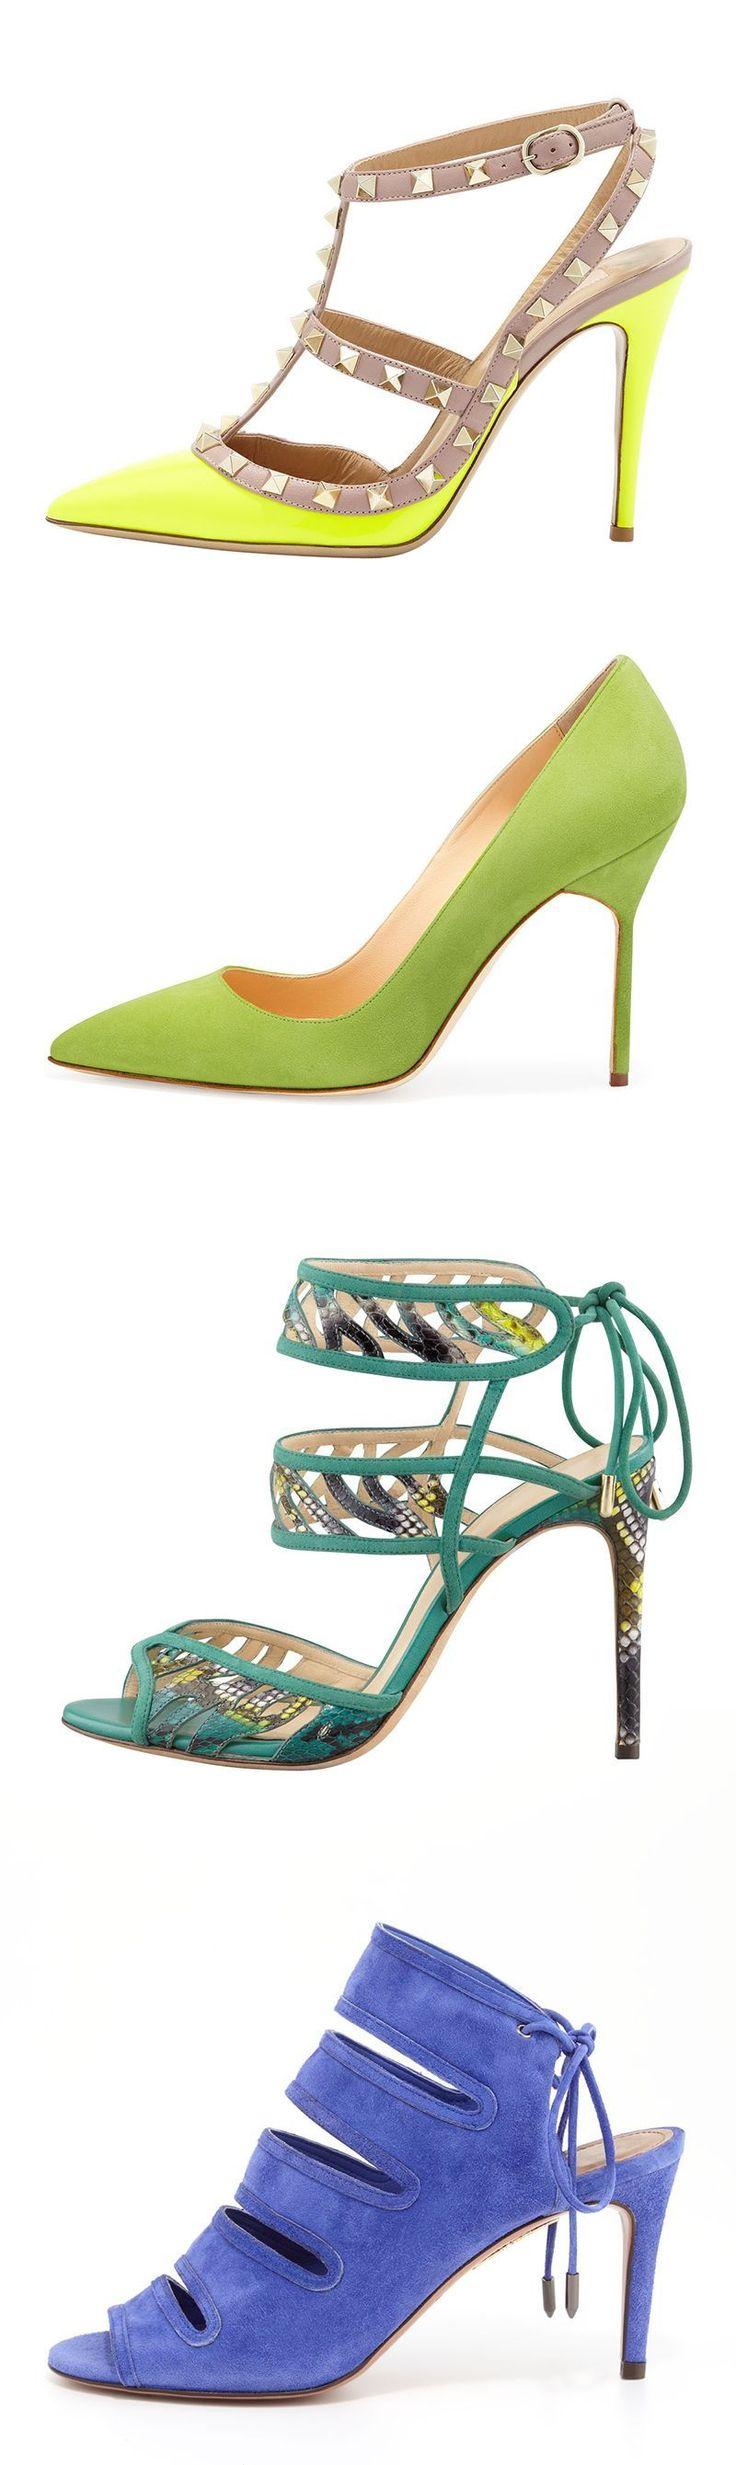 THE VIVIDS - Add the unexpected color - neon Valentino, chartreuse Manolo Blahnik, aquamarine Alexandre Birman or cerulean Aquazurra. #manoloblahnikheelscolour